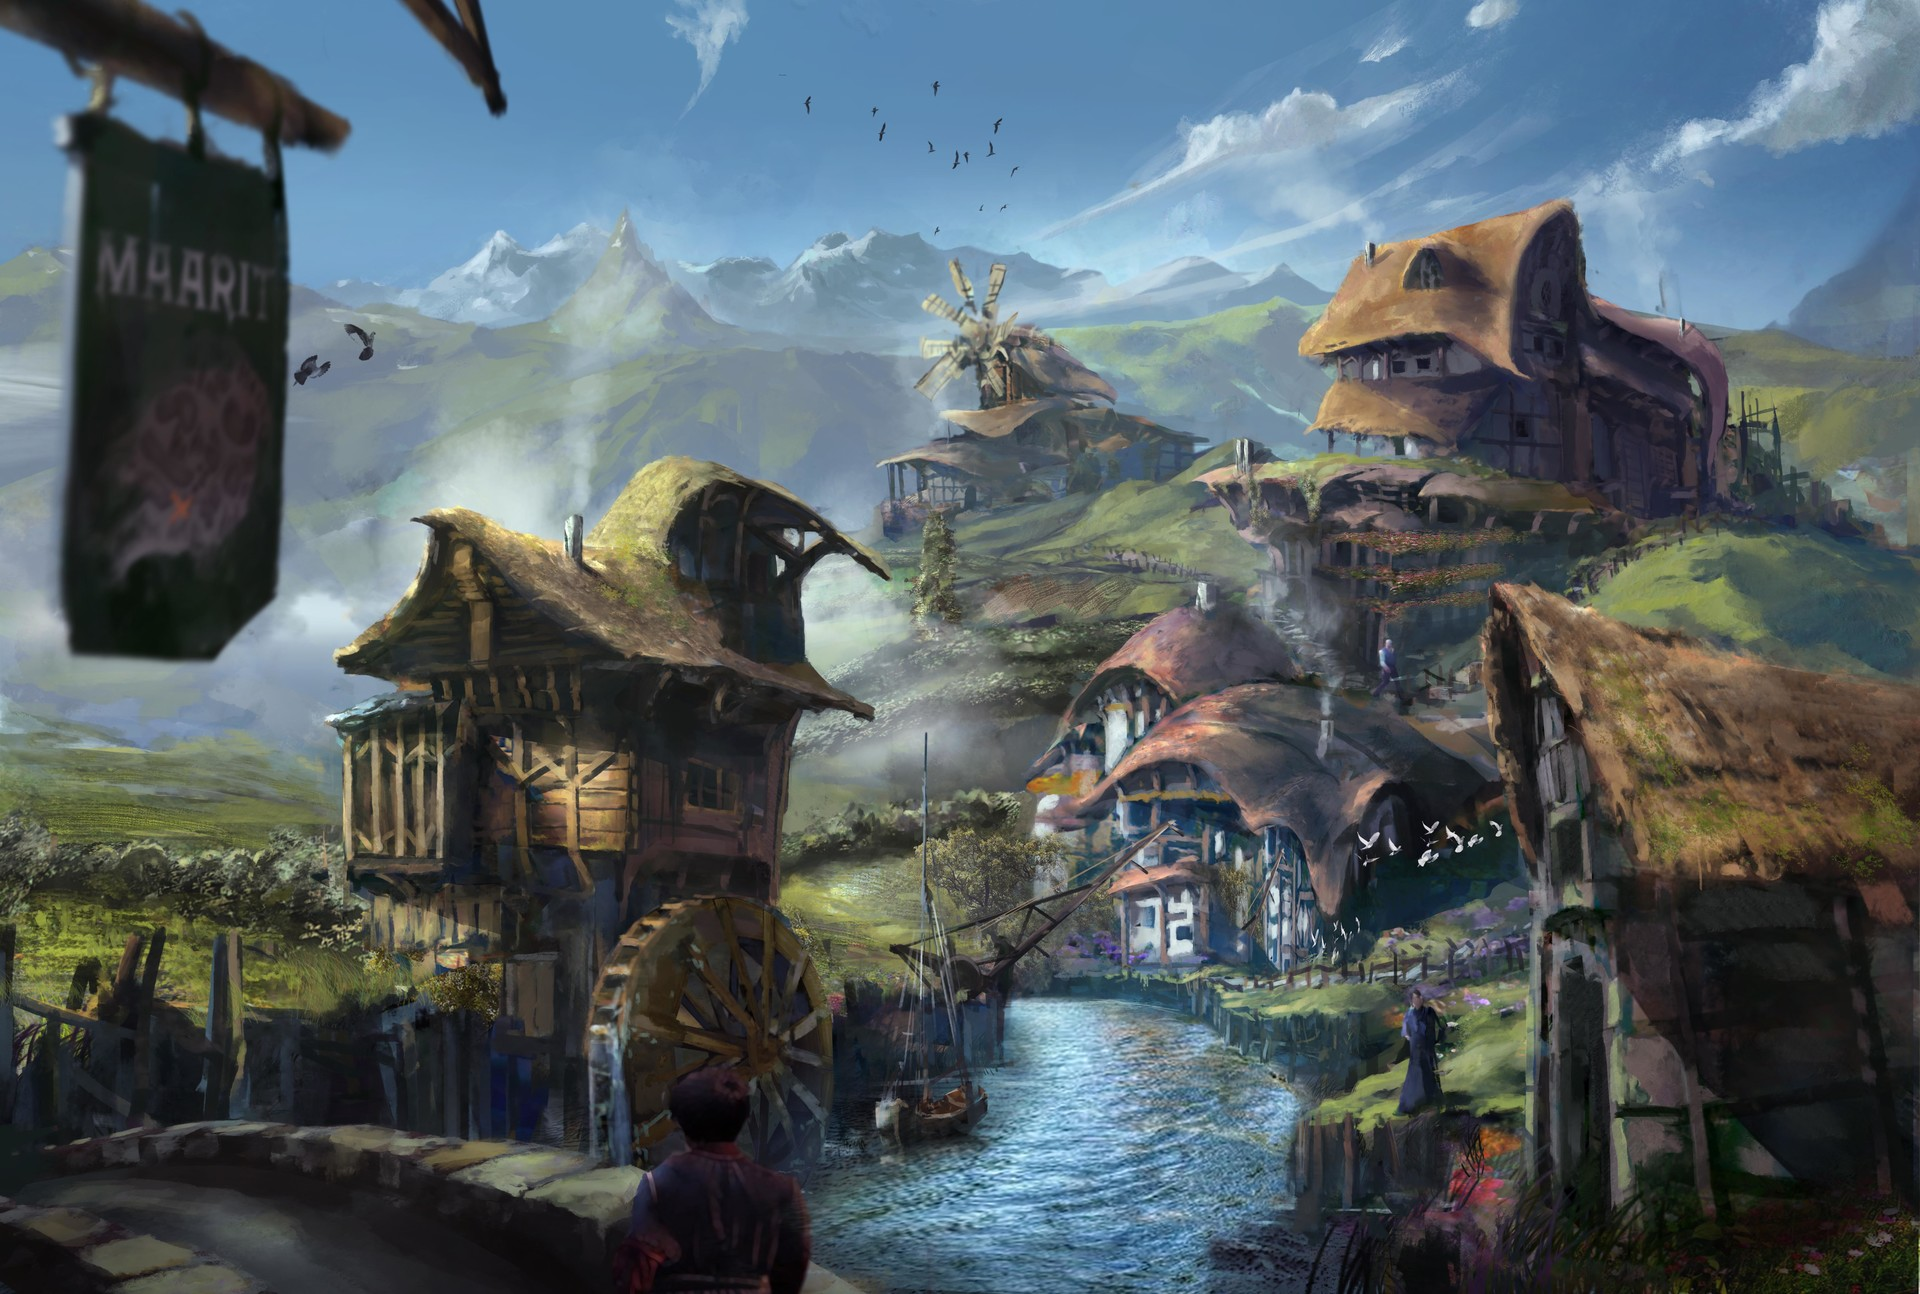 Rain Fall Hd Wallpaper Download Artstation Fantasy Fishing Village And Town Centre For